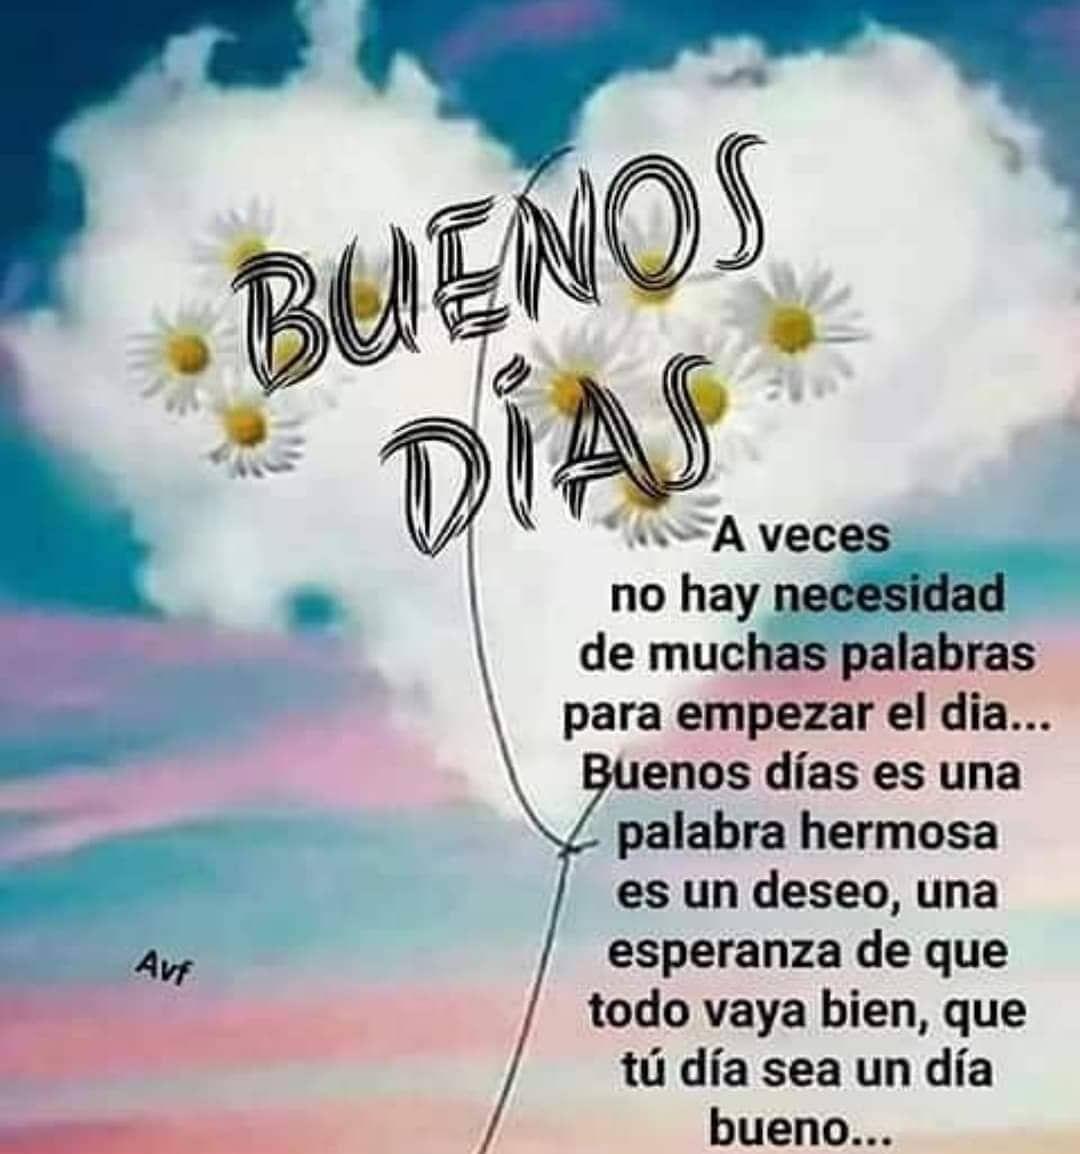 SIGUEME 👉 @leojuansinmiedo Buenos días amigos !  #buenosdias #felizdia #felizdomingo #domingo  #graciasadios #Dios #reflexion #hoy…